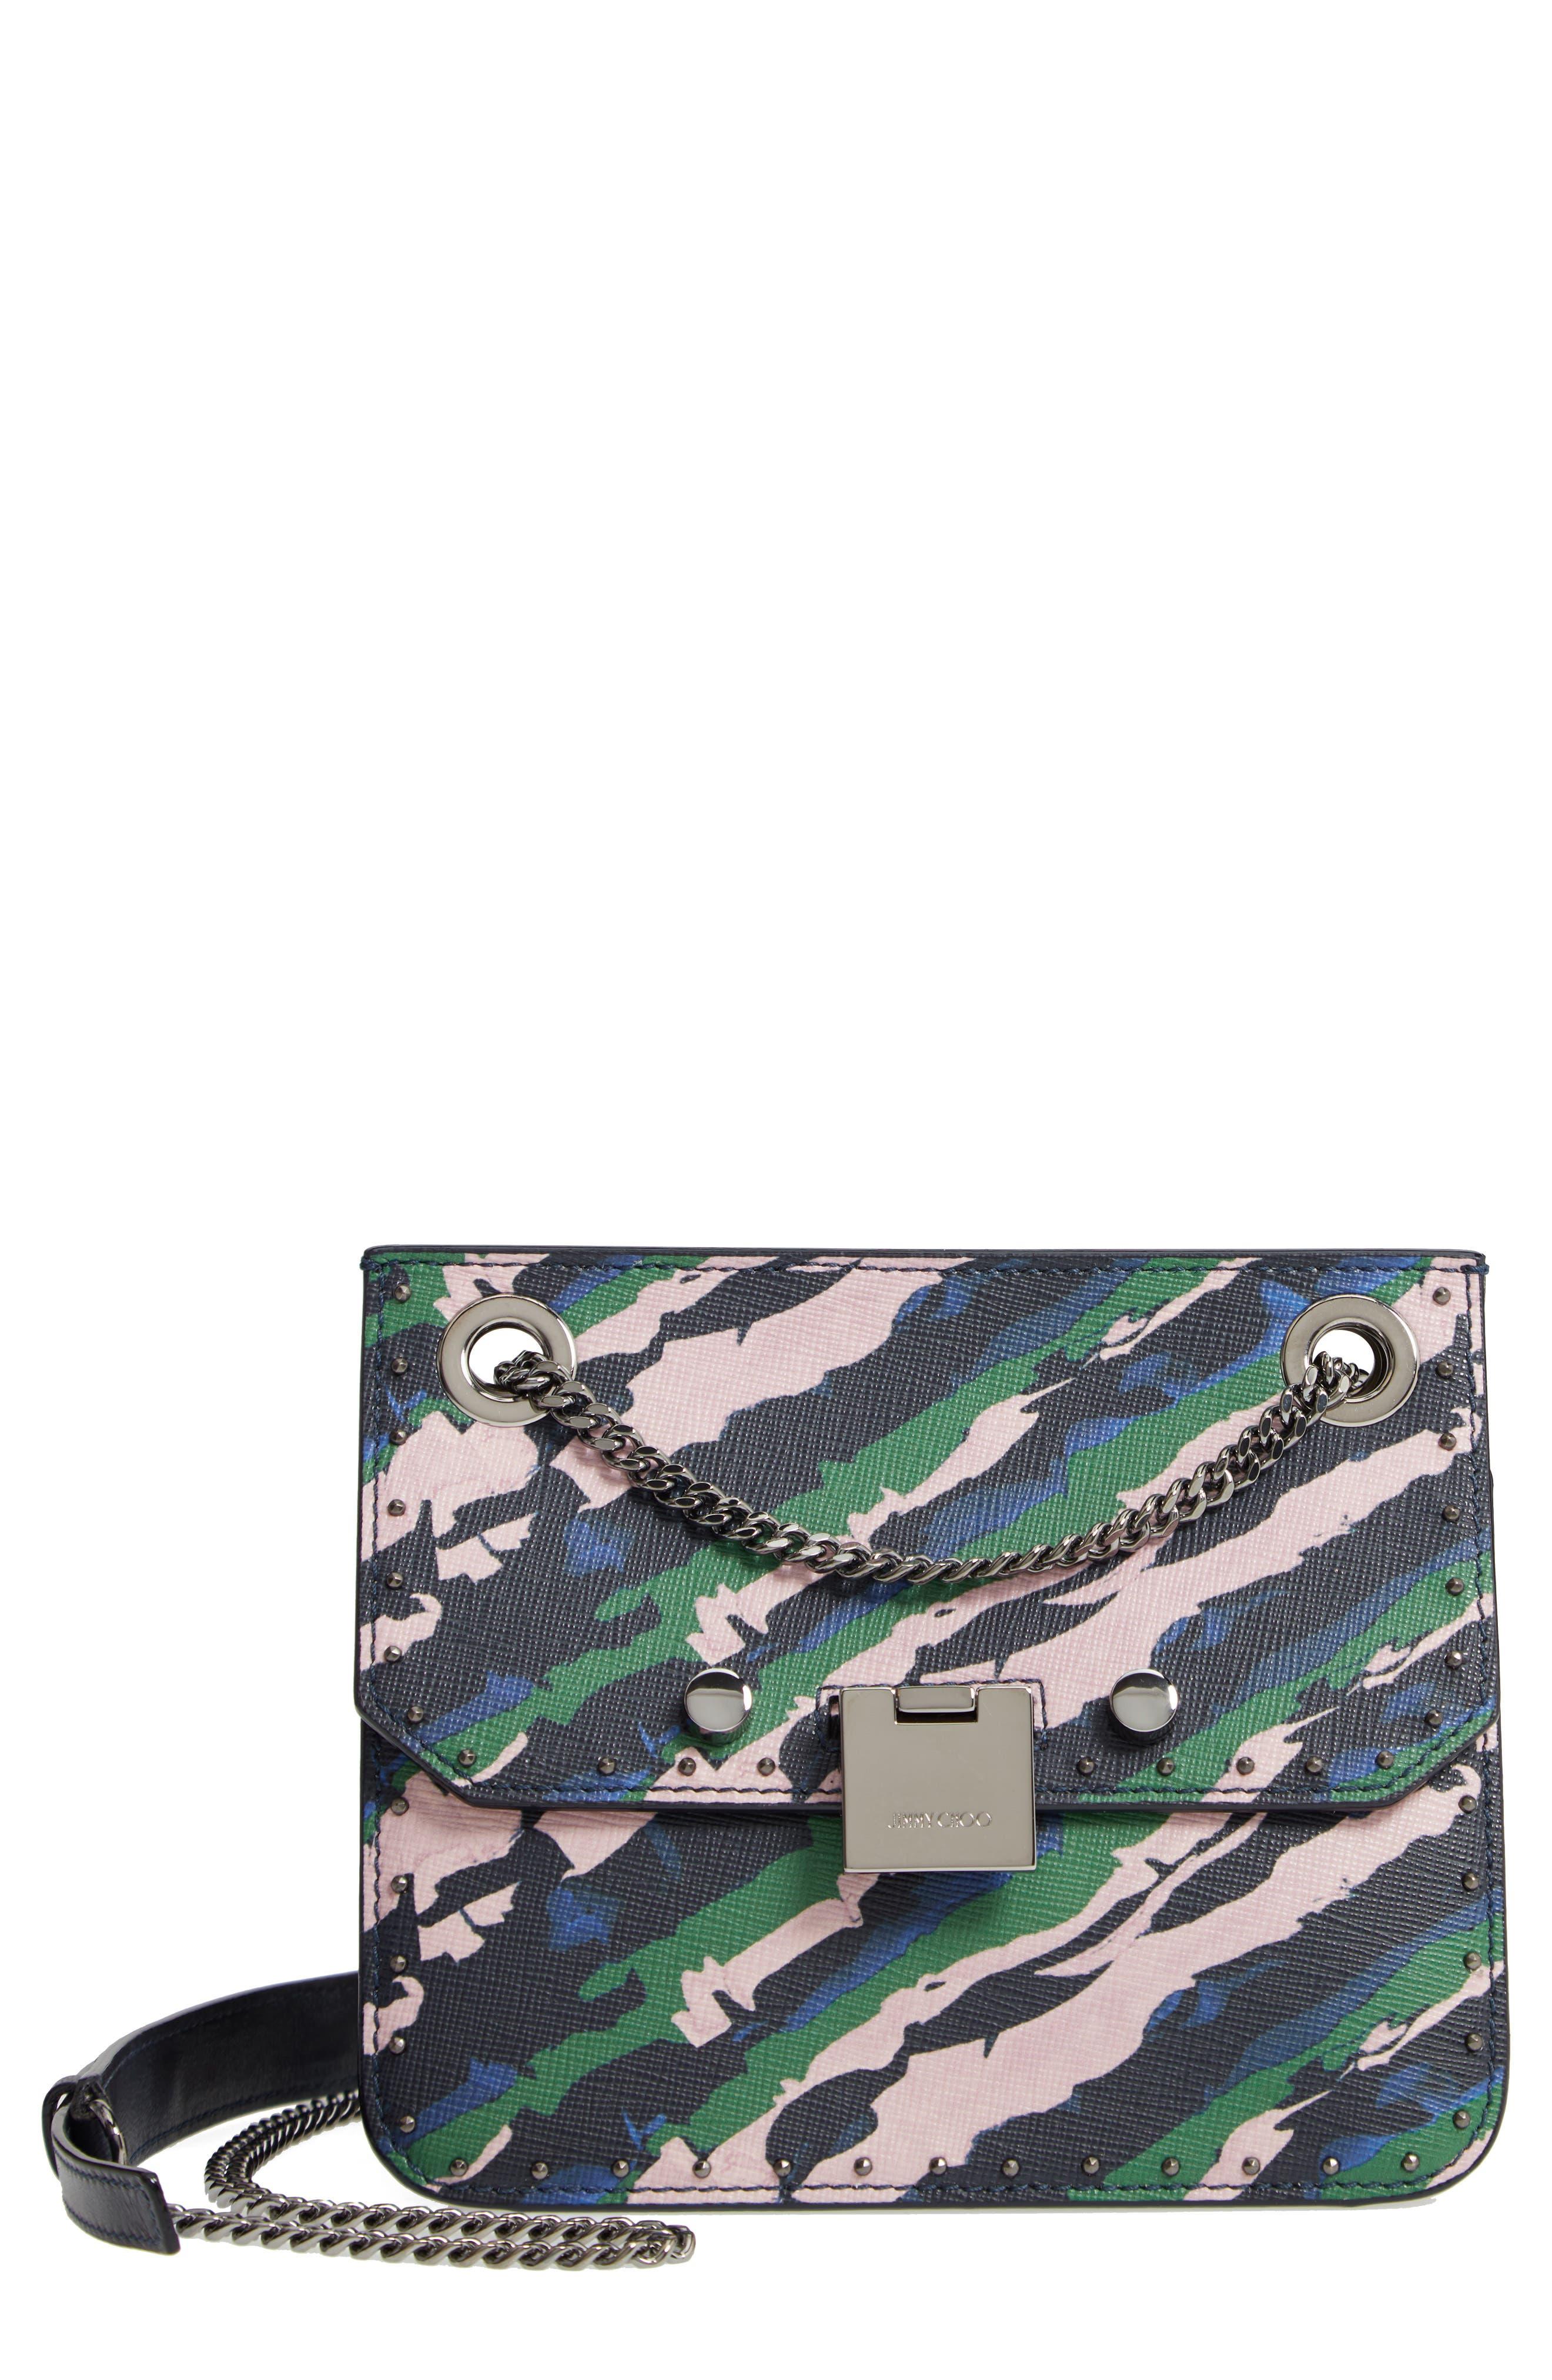 Rebel Leather Crossbody Bag,                             Main thumbnail 1, color,                             410